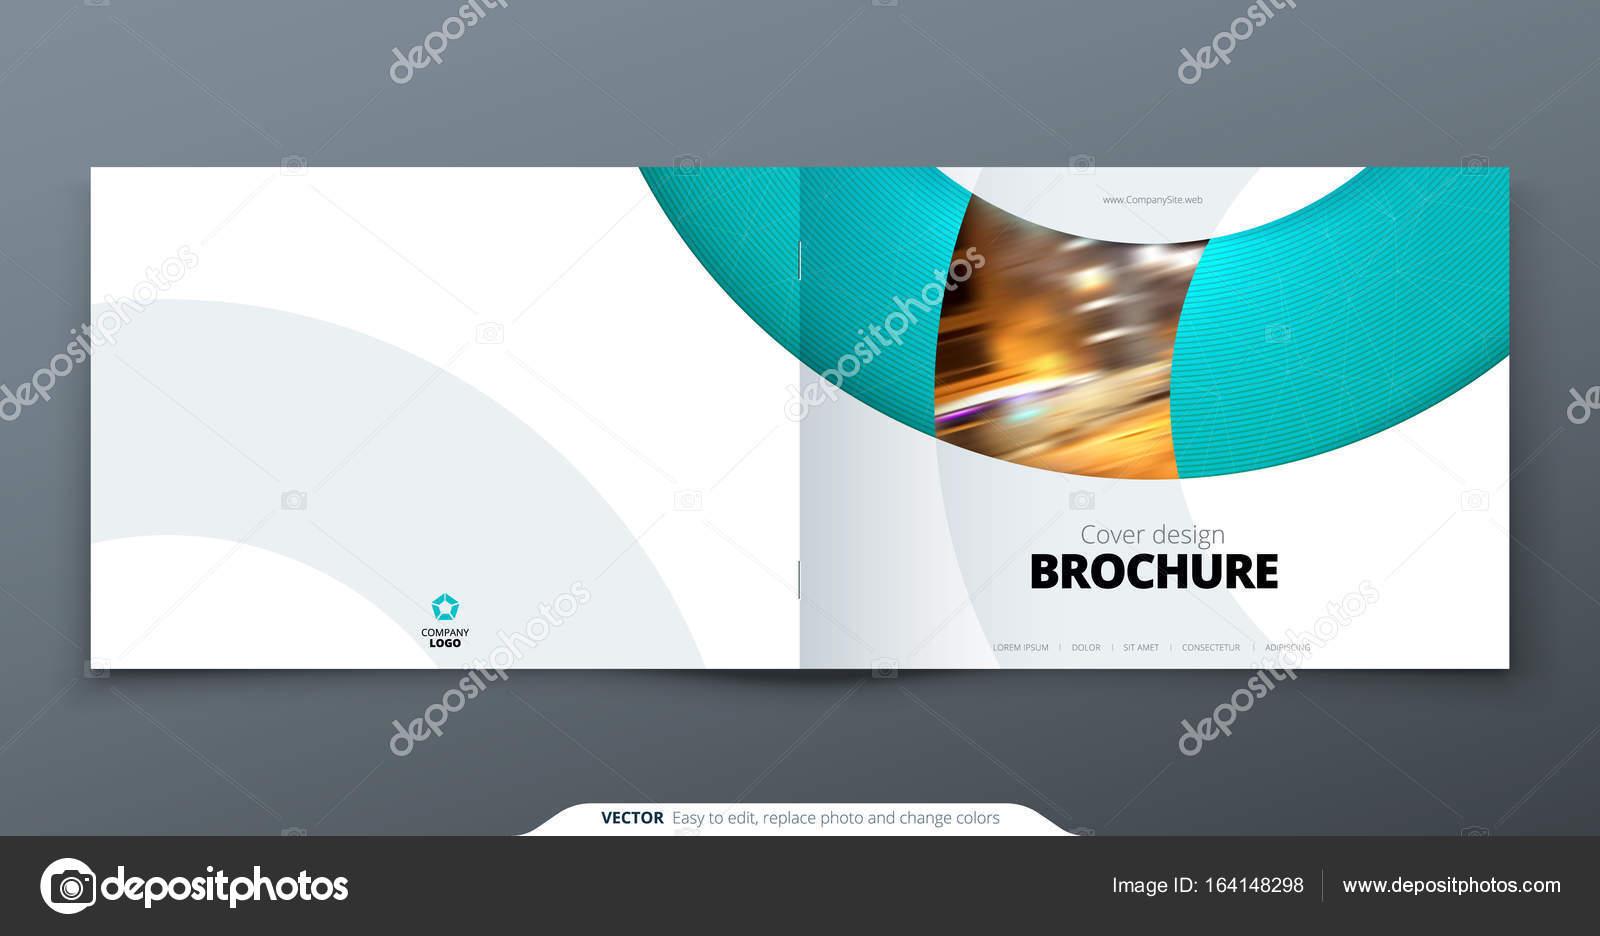 Landscape Brochure Design Teal Corporate Business Rectangle